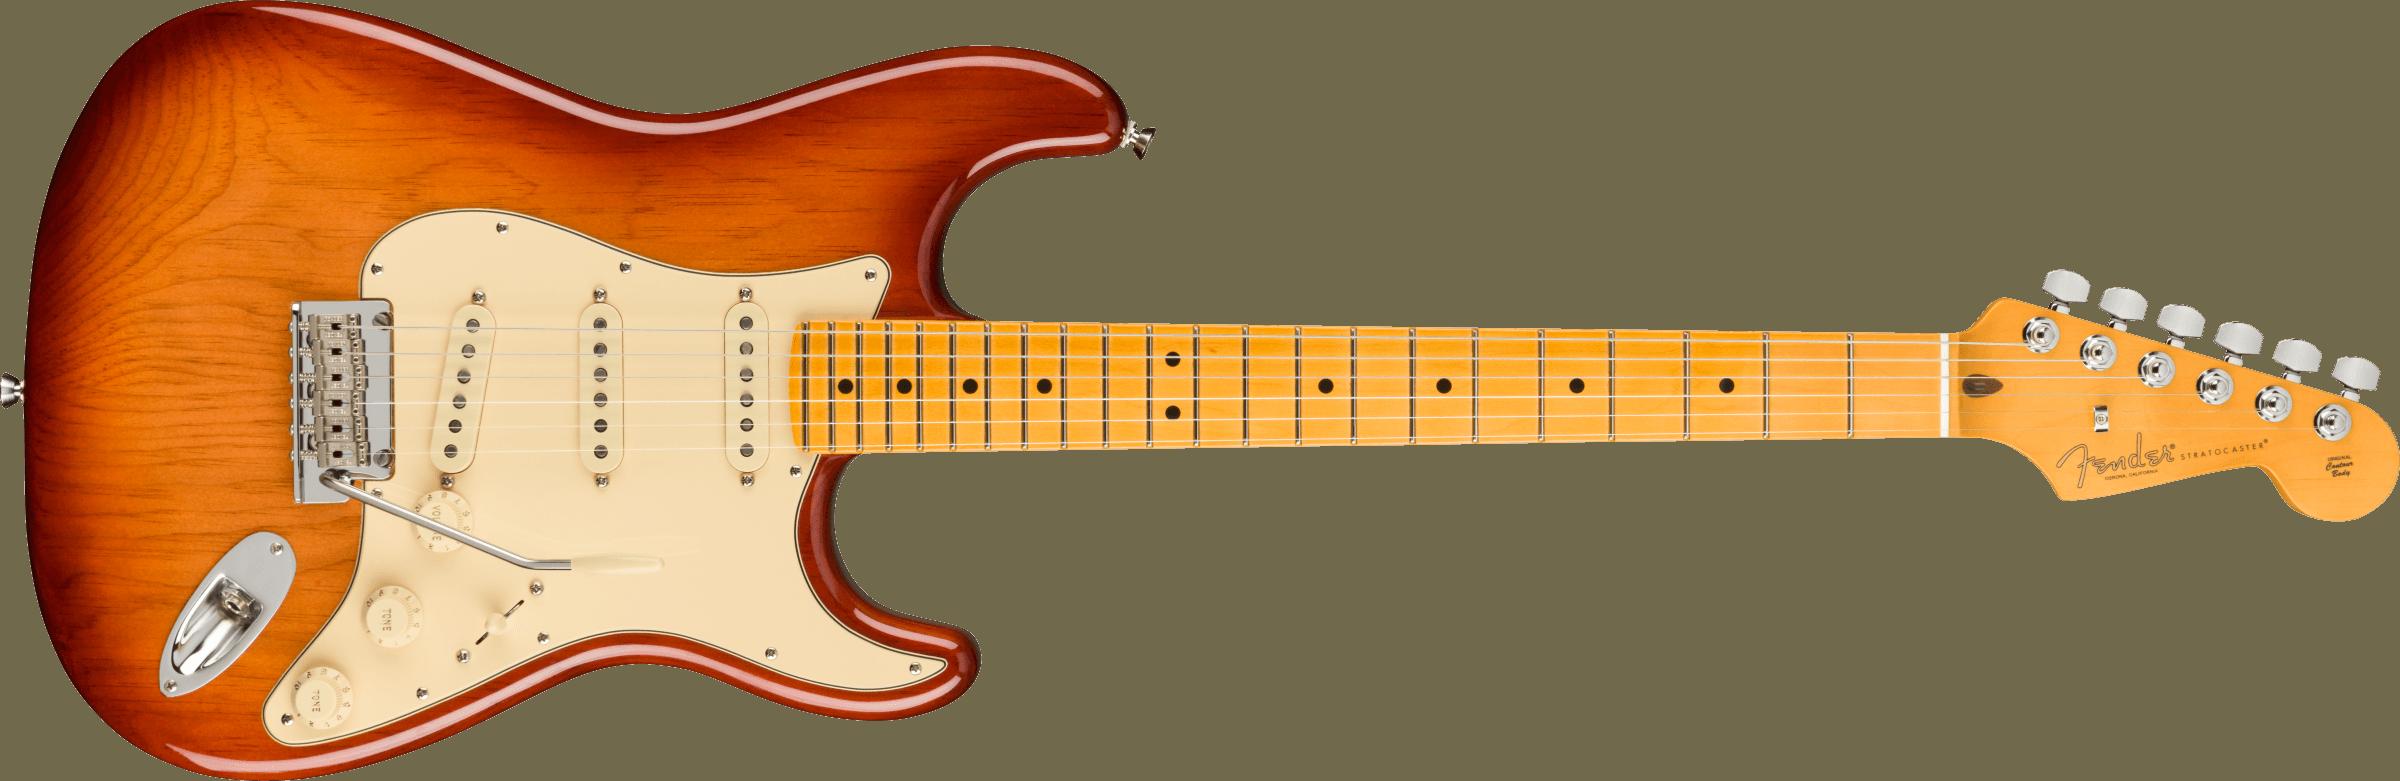 Fender American Pro II Stratocaster SSS M Sienna Sunburst